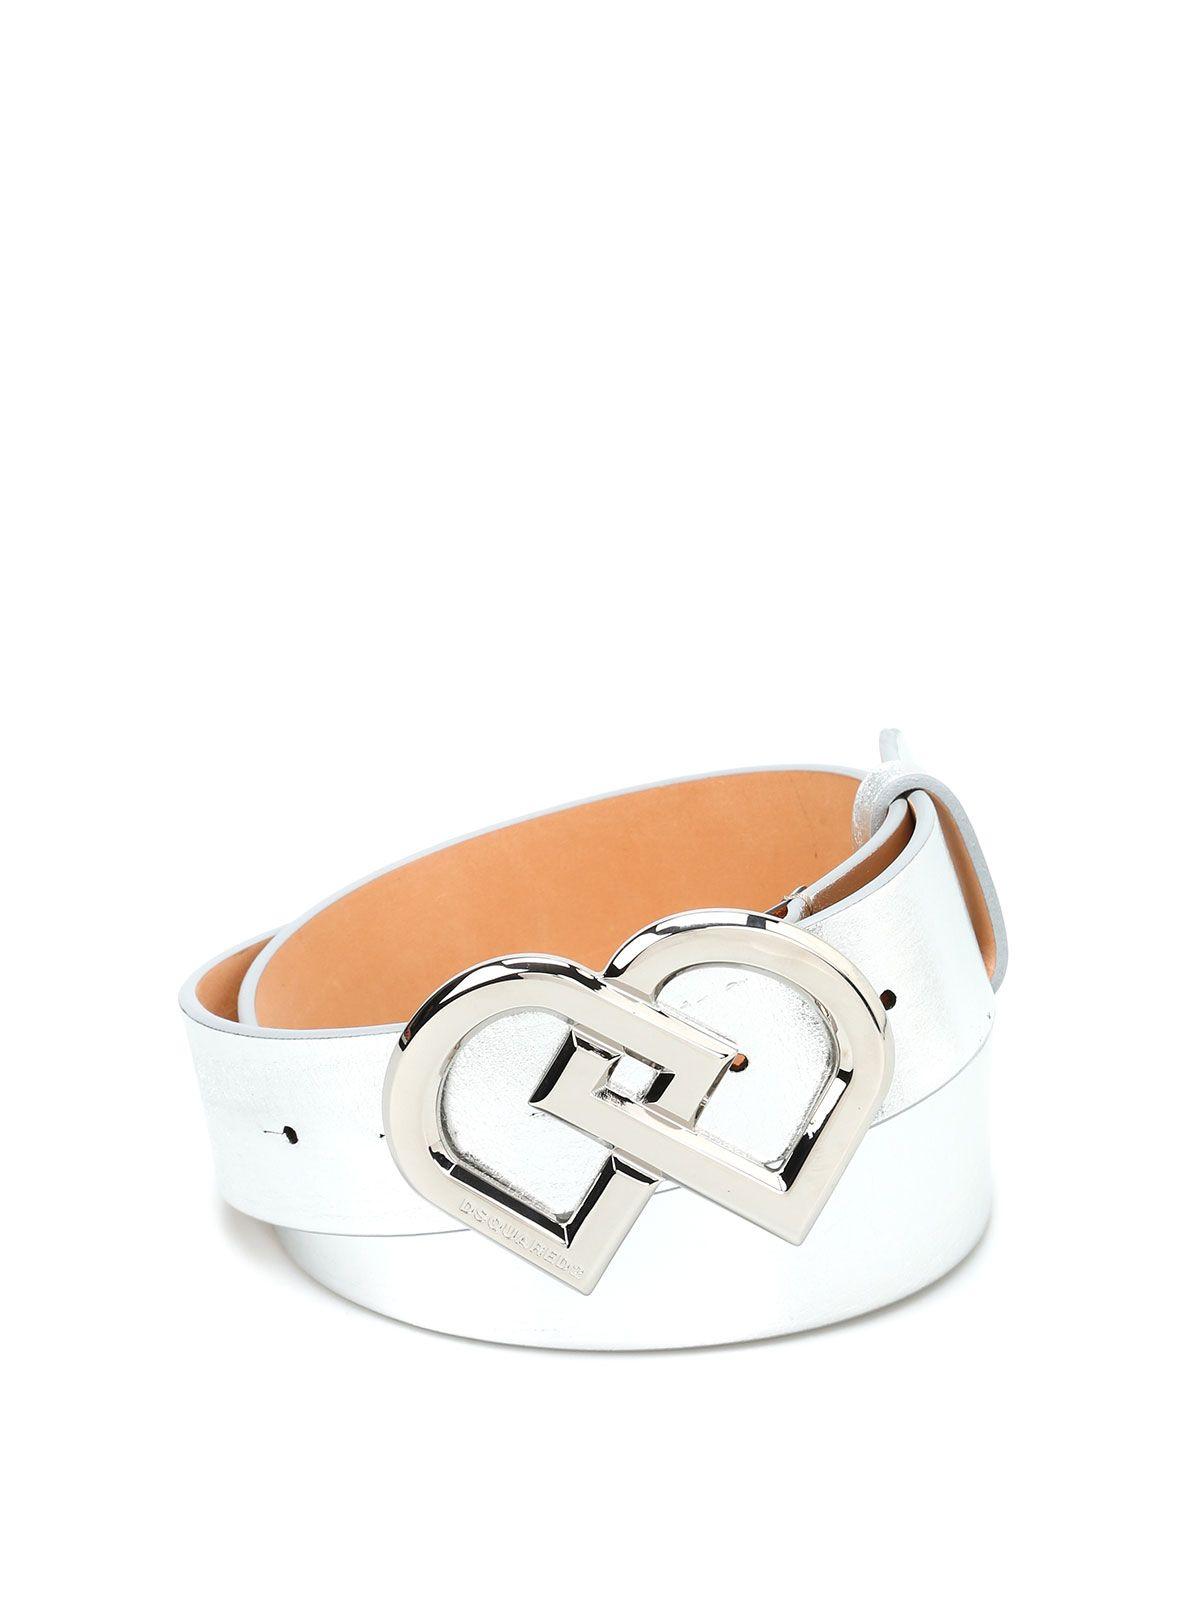 Dsquared2 Dd Leather Belt